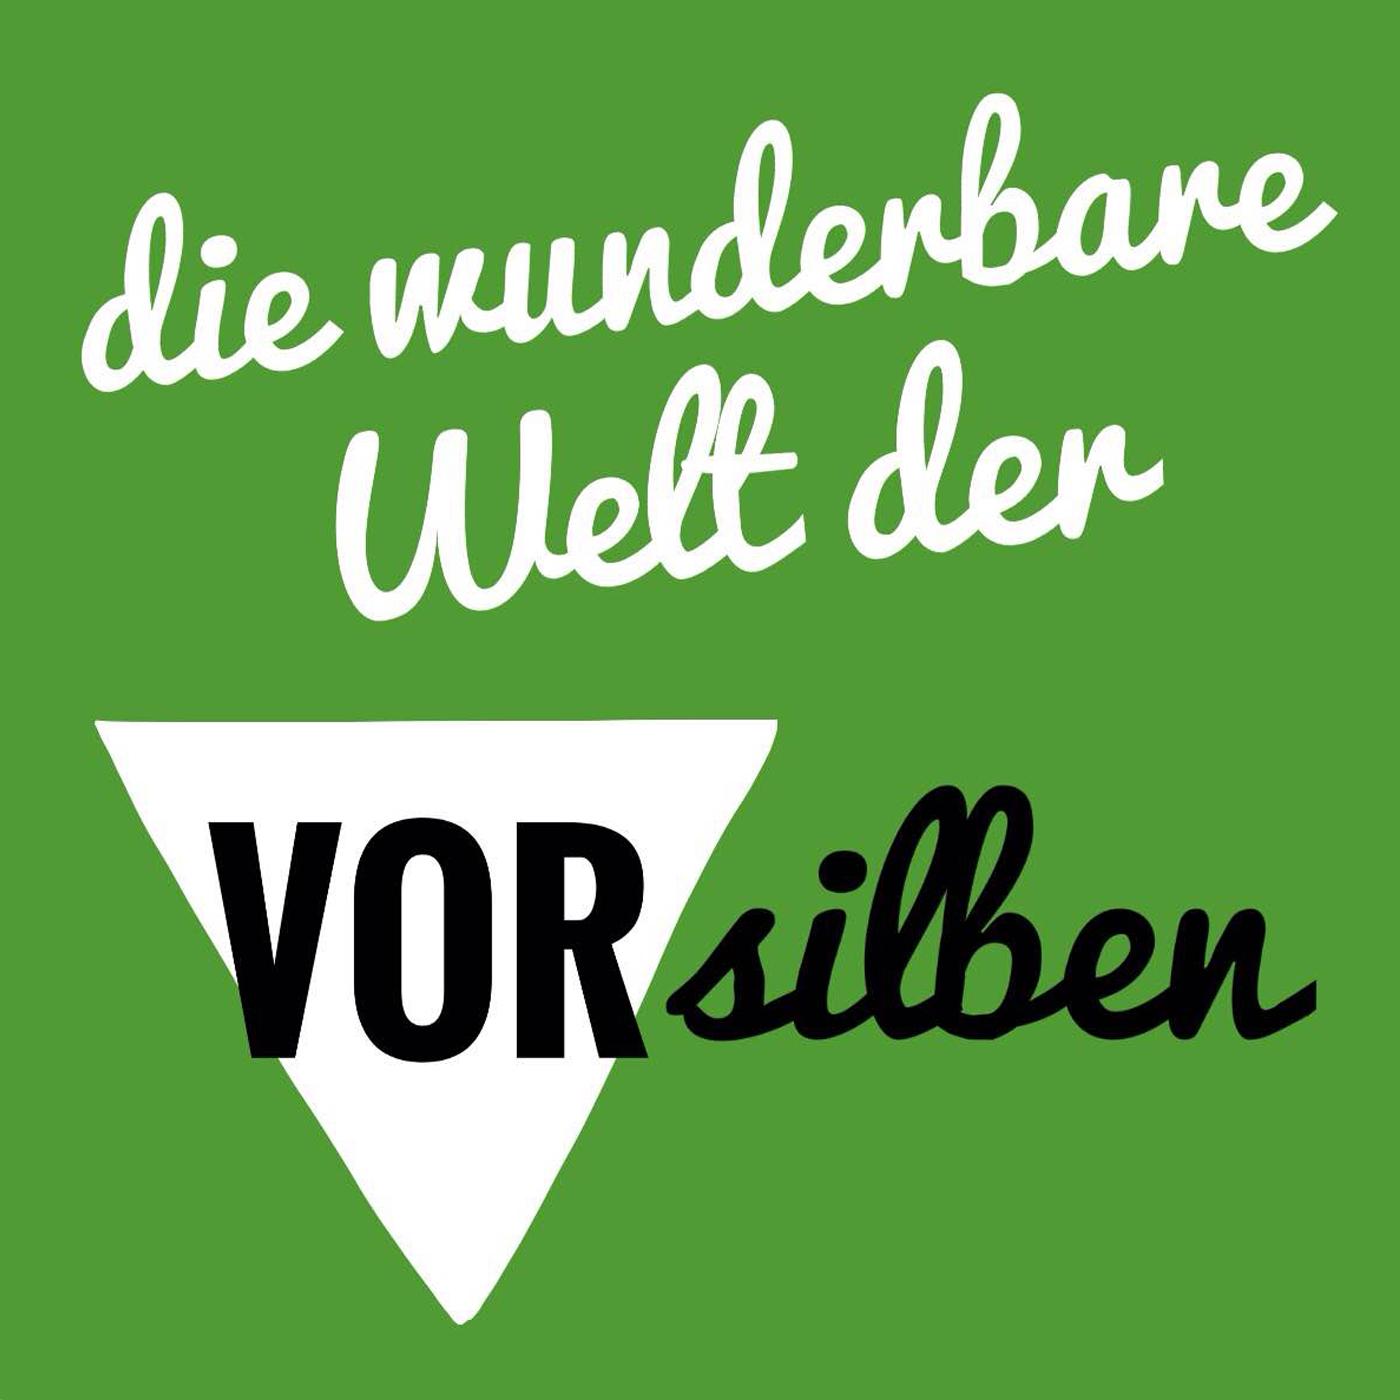 07_die_wunderbare_Welt_der_Präfixe_deutschwortschatz.de